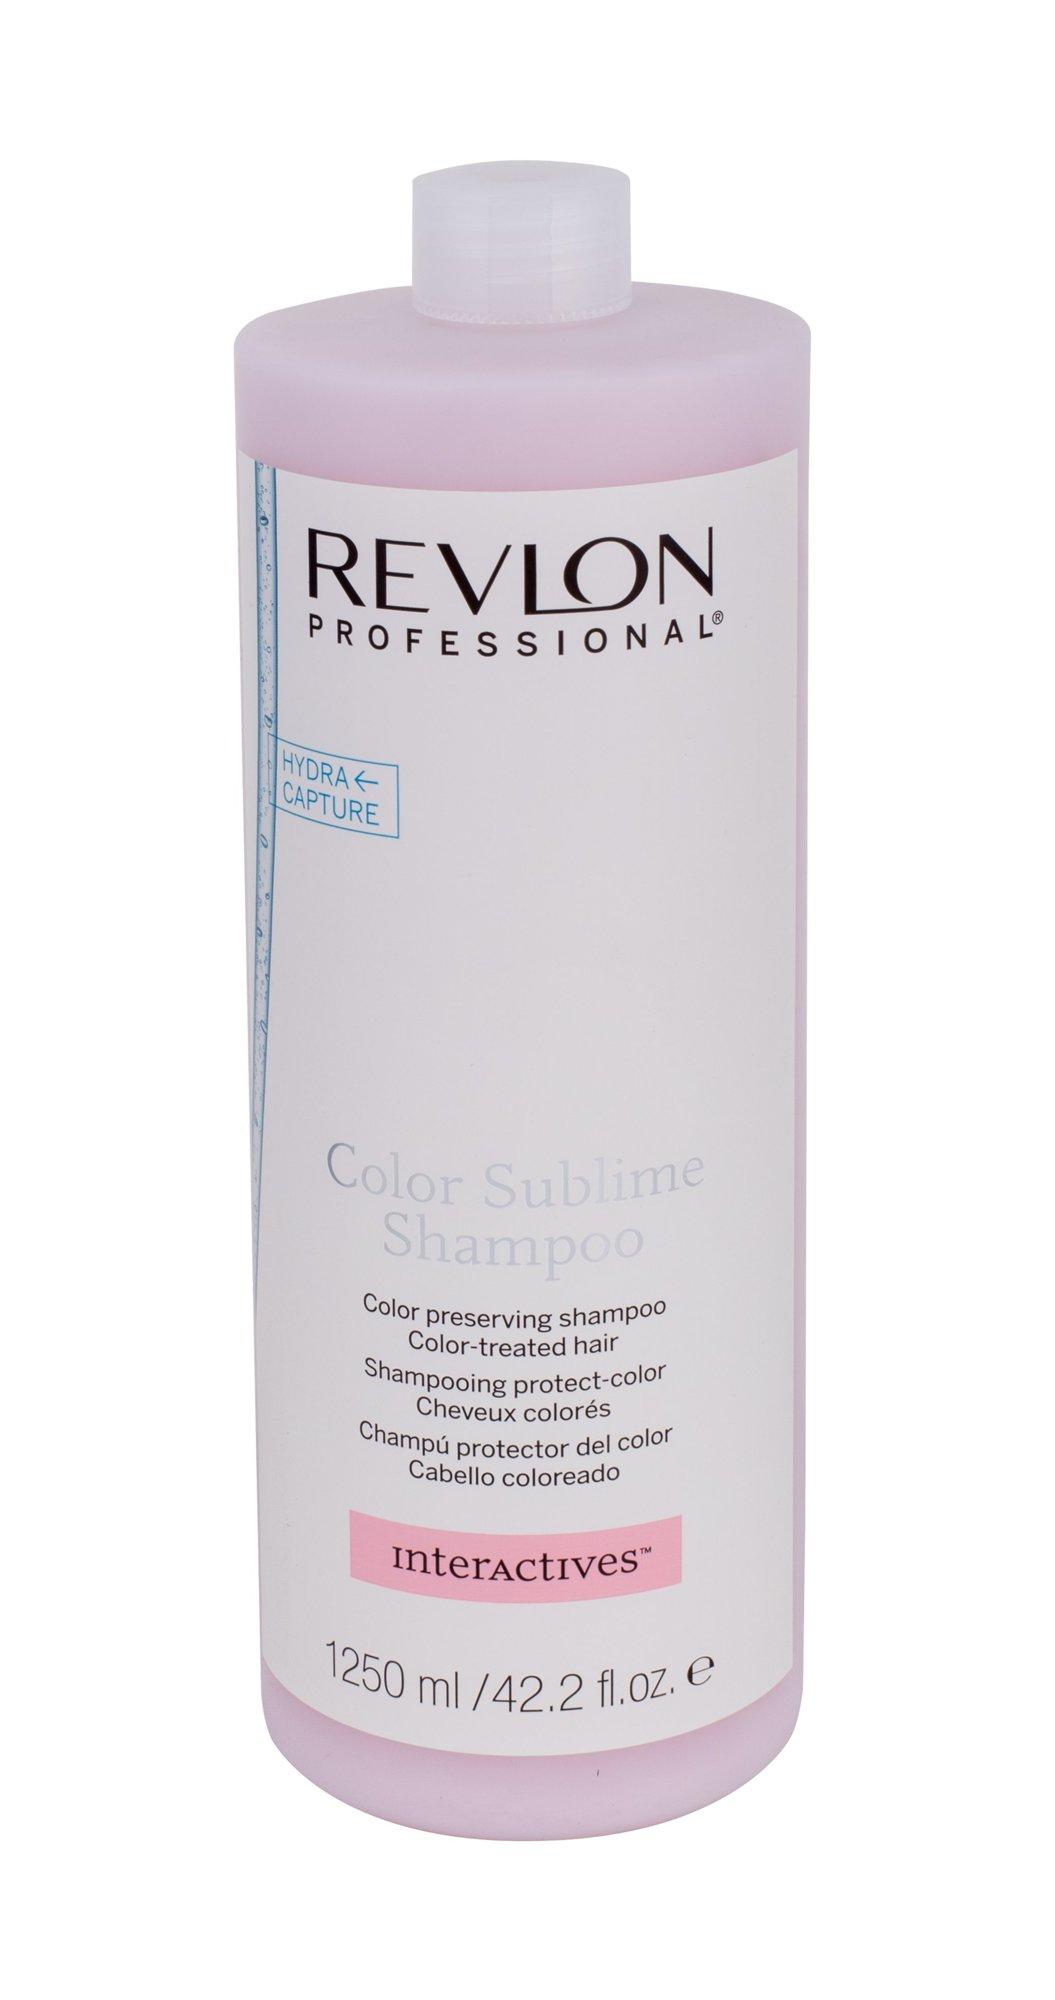 Revlon Professional Interactives Cosmetic 1250ml